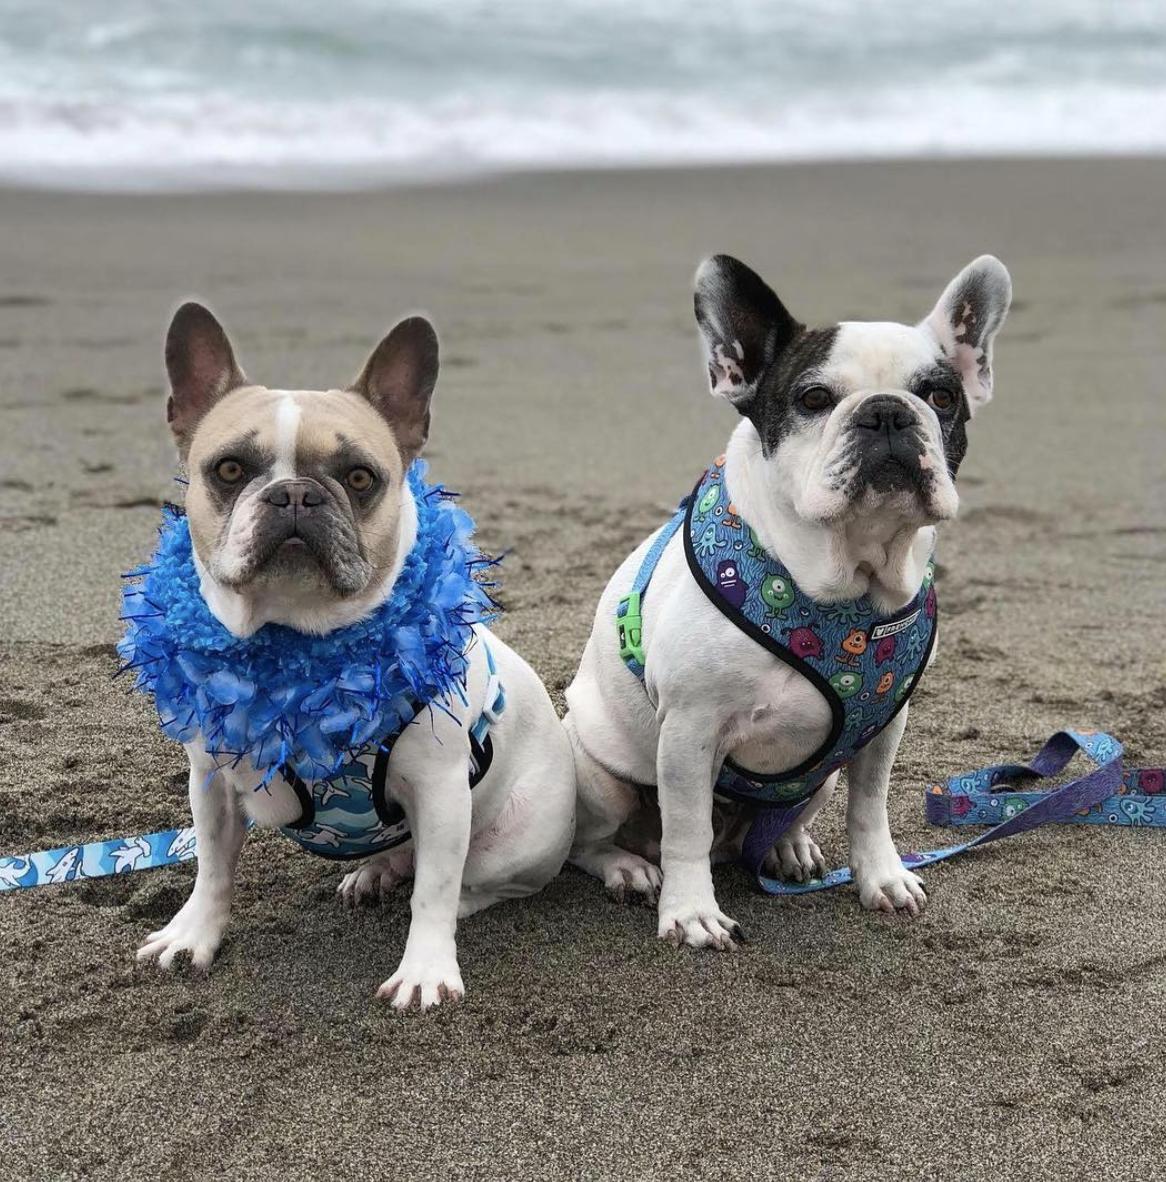 Cherie with her bro ace Photo credit: @cheriethesurfdog